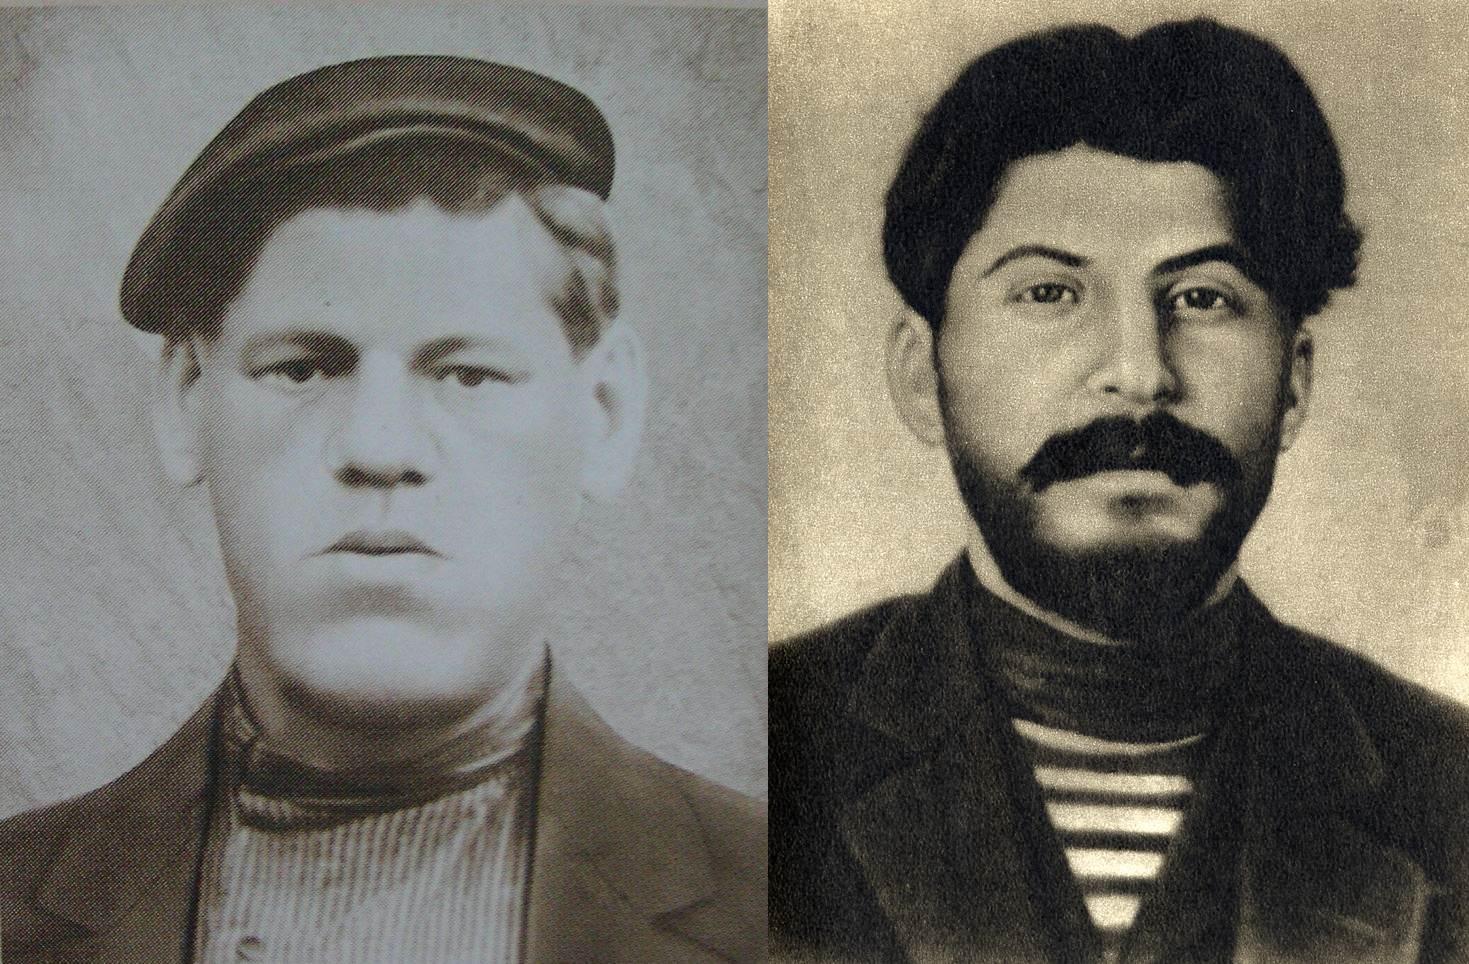 Боград Яков Ефимович-Сталин Иосиф Виссарионович